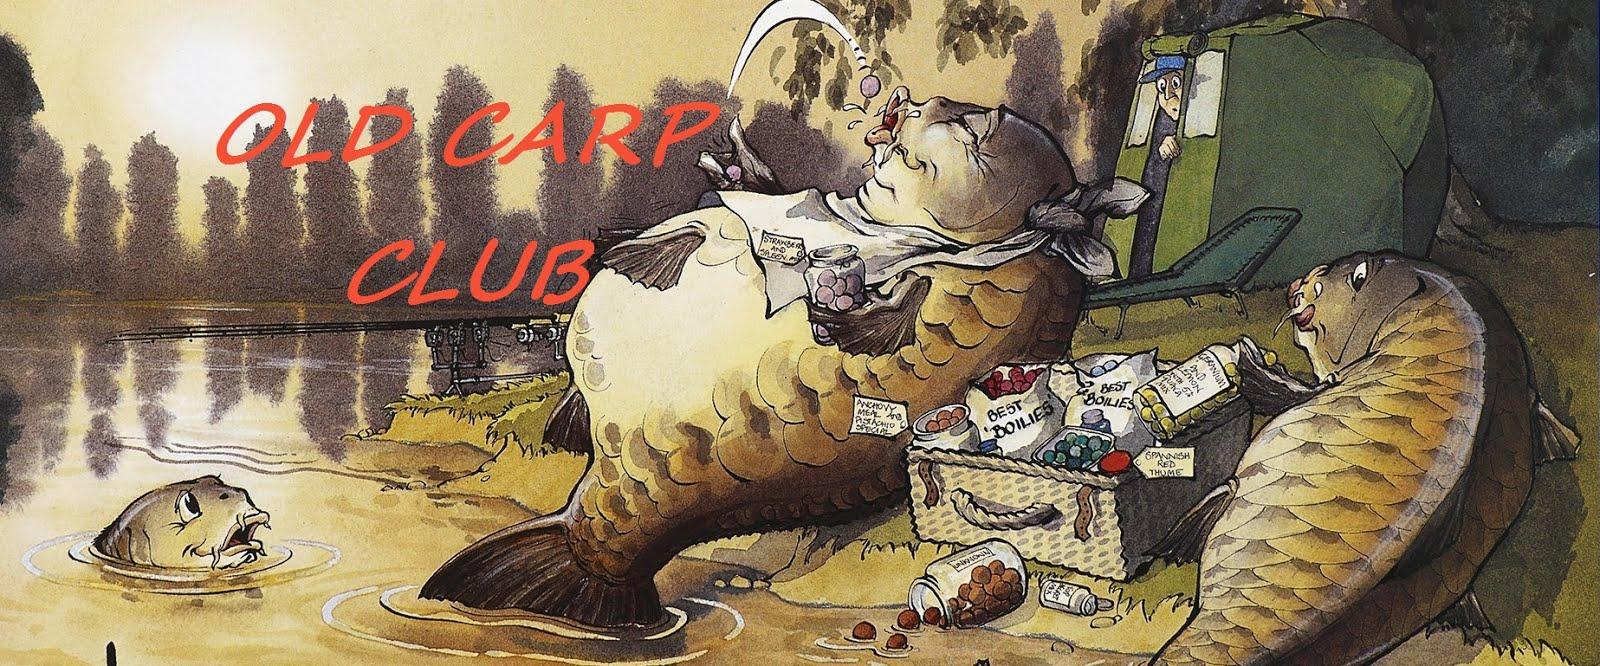 OLD CARP CLUB